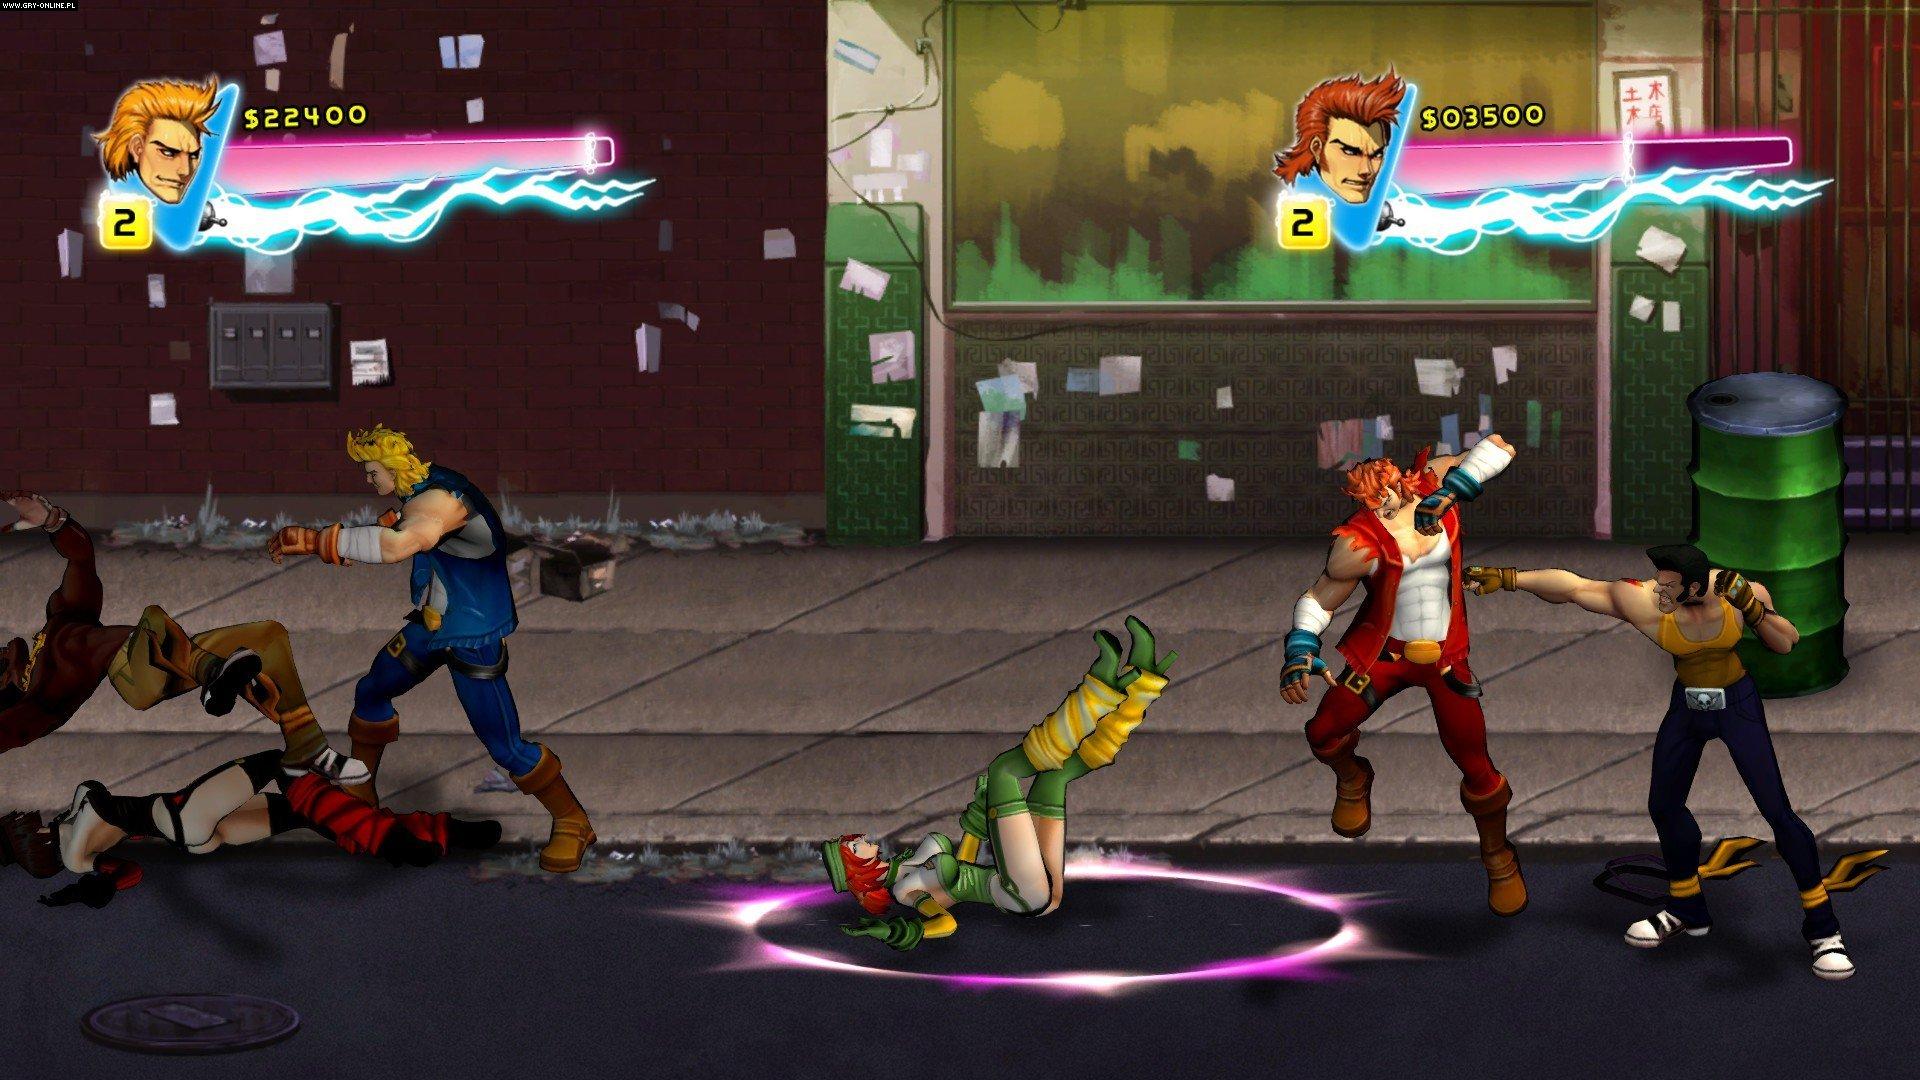 Double Dragon: Neon Nintendo Switch